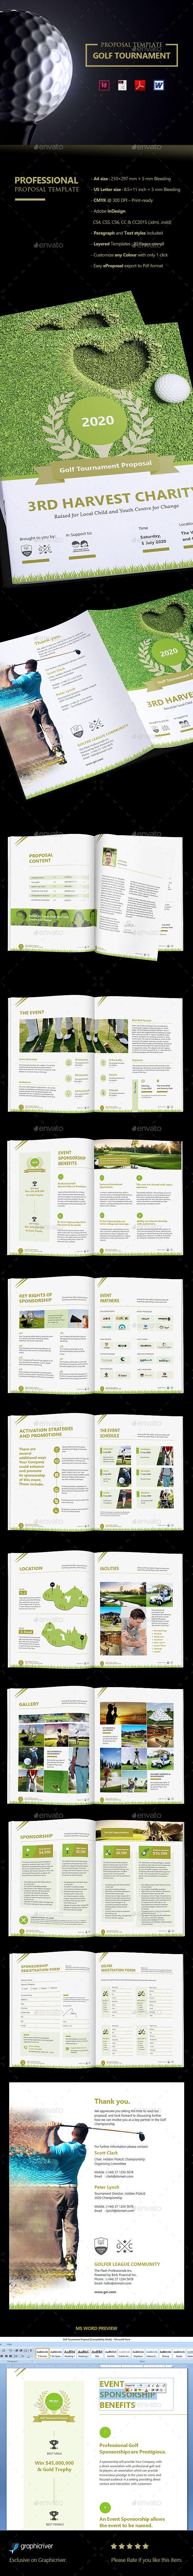 Clean Golf Tournament Proposal Clean Golf Tournament